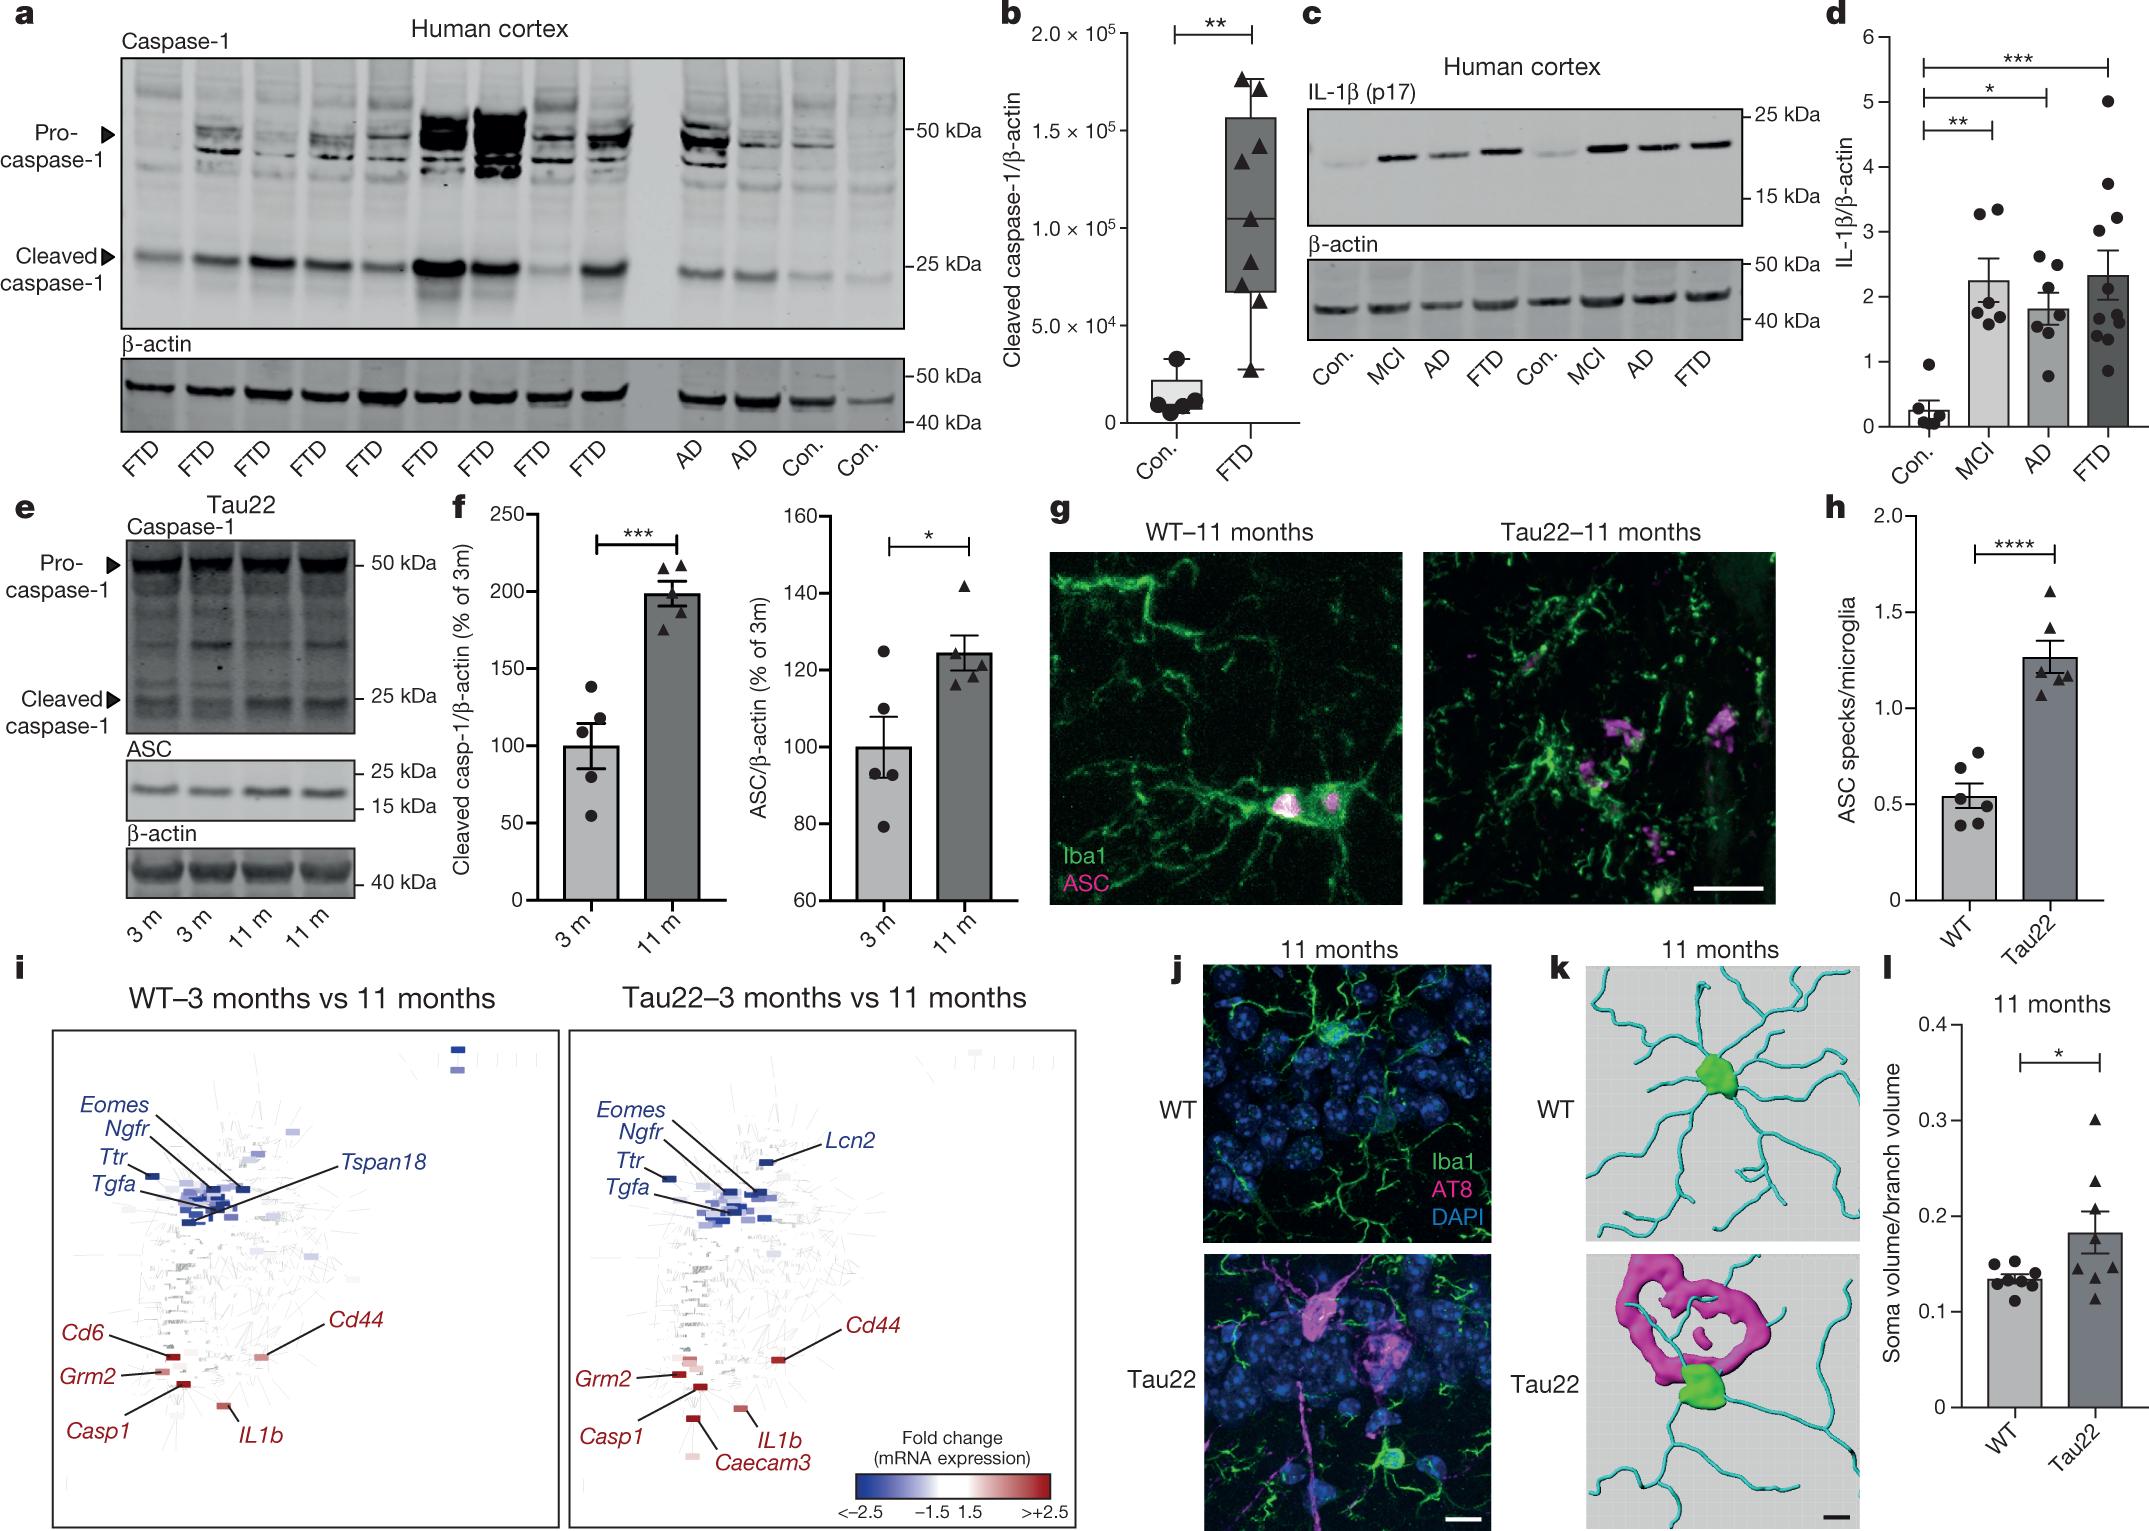 NLRP3 inflammasome activation drives tau pathology